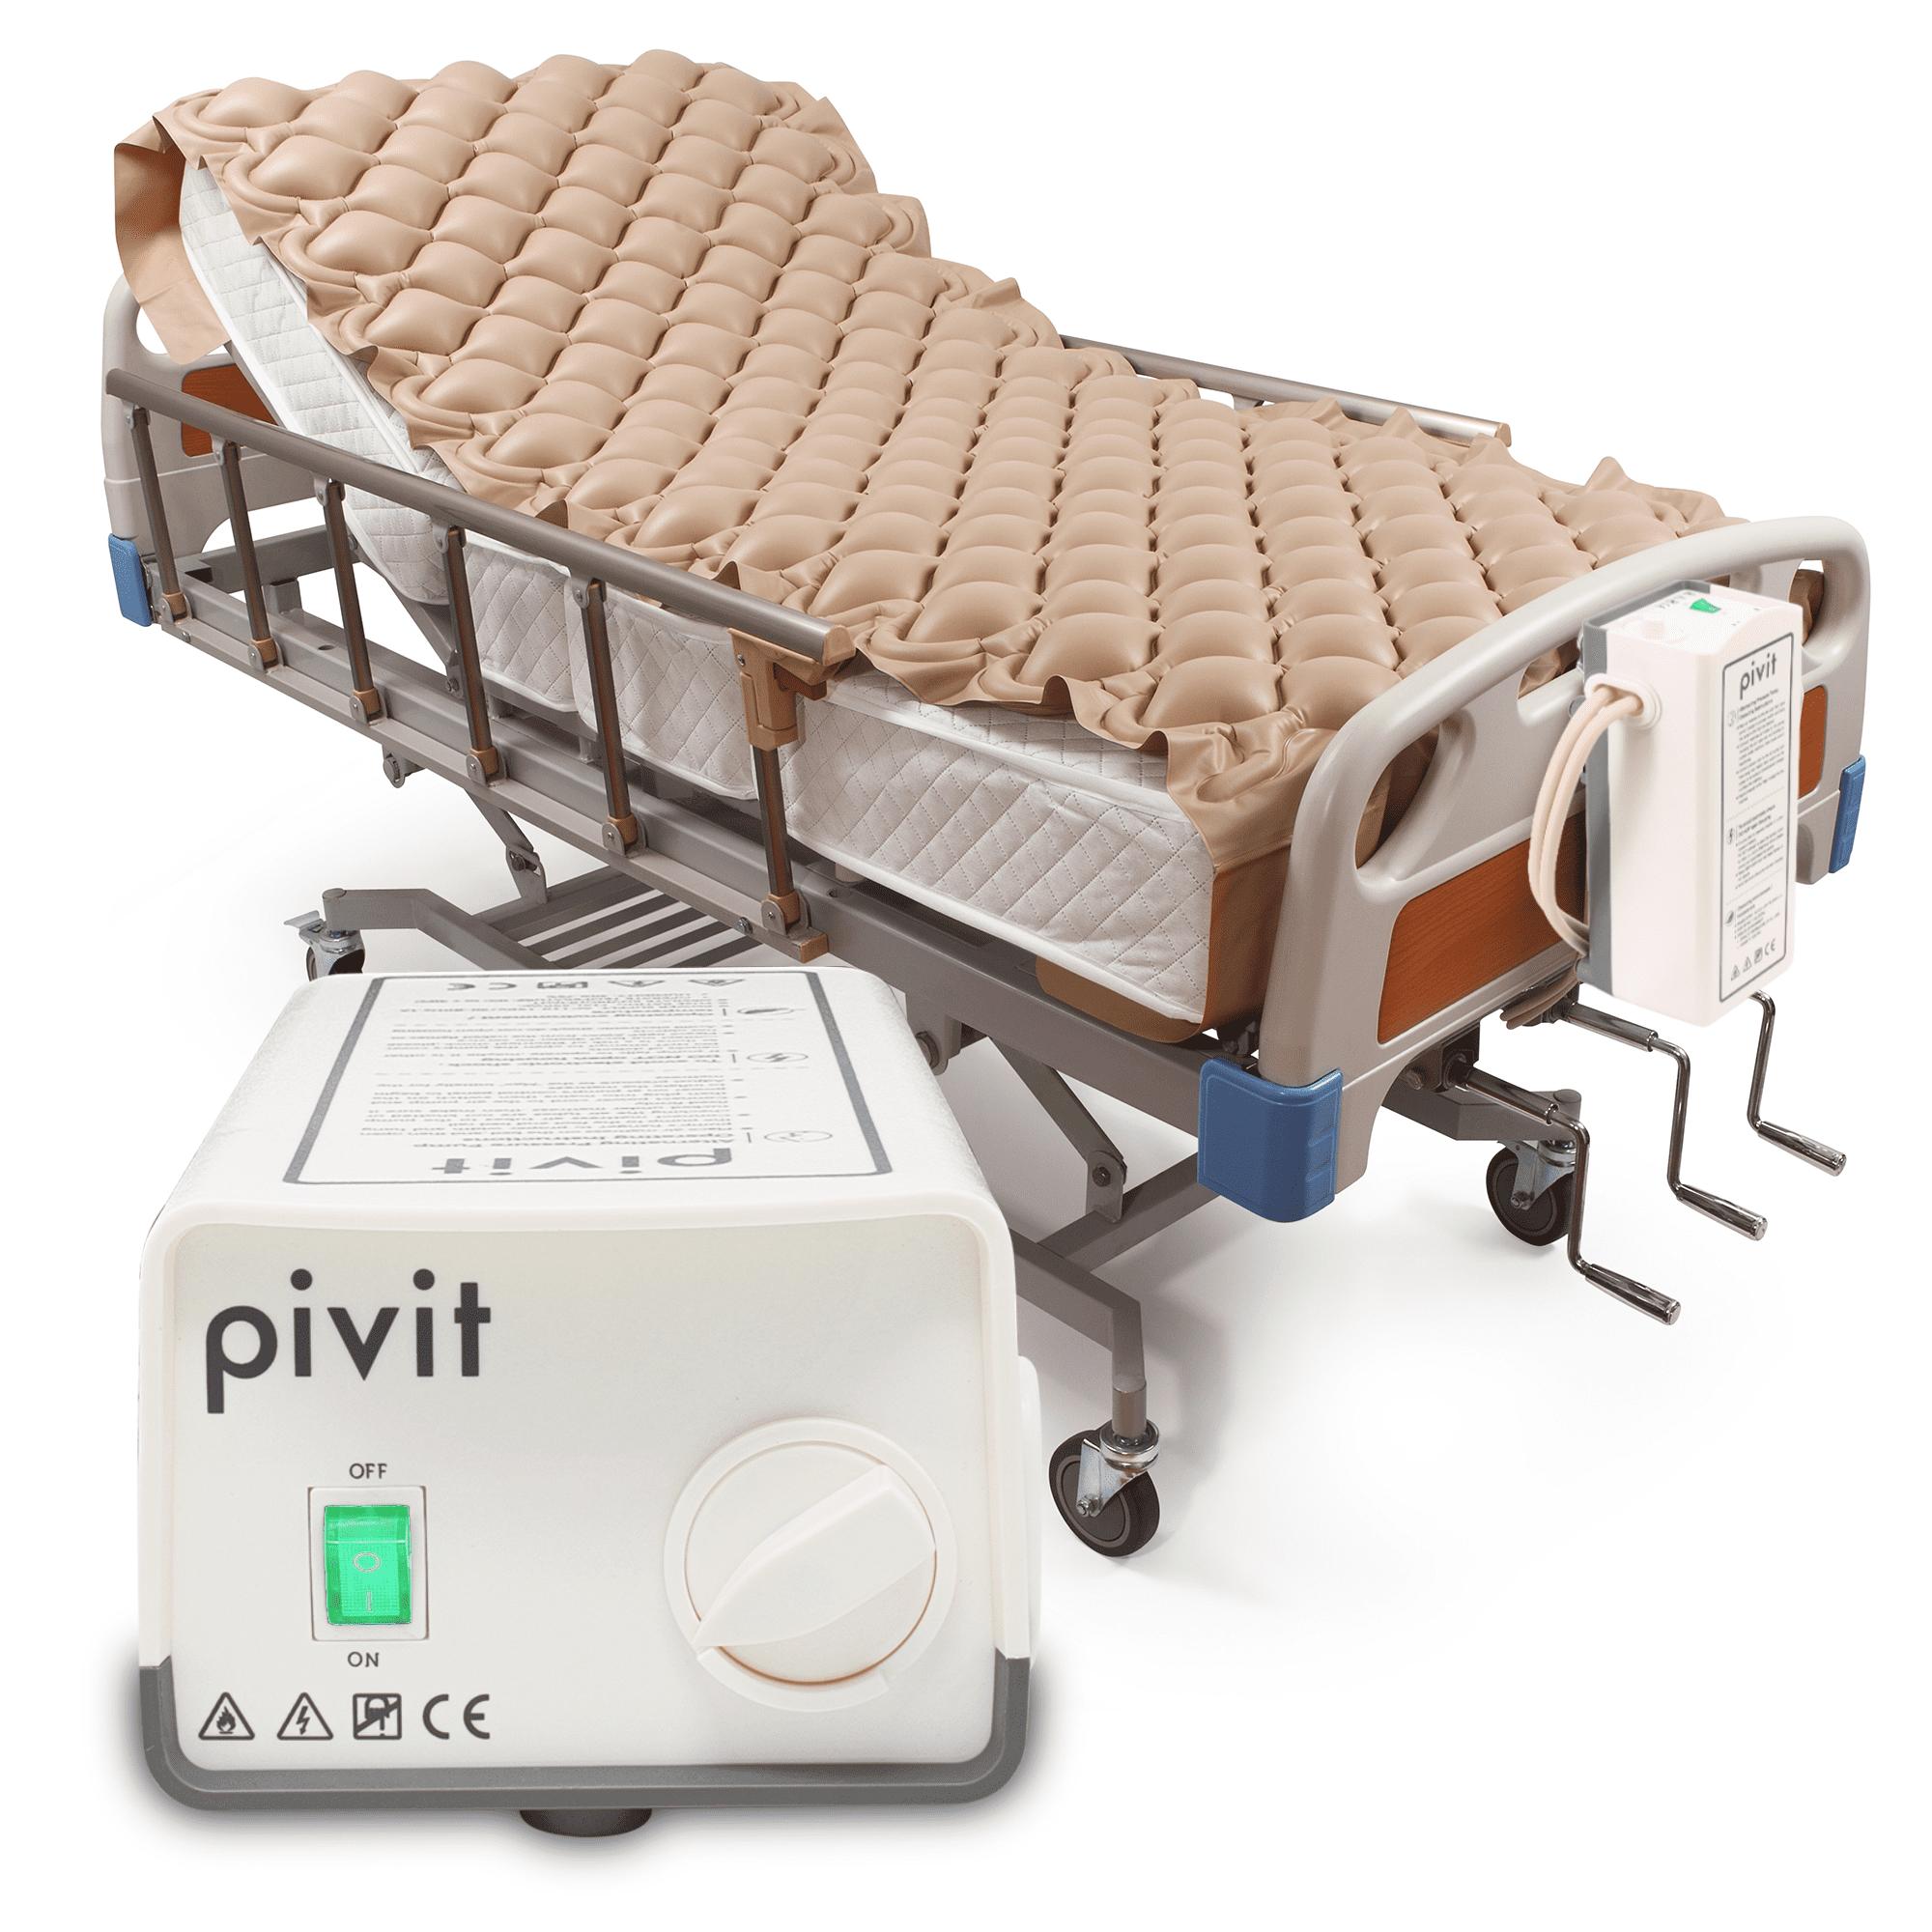 Pivit Alternating Pressure Mattress   Includes Electric ...